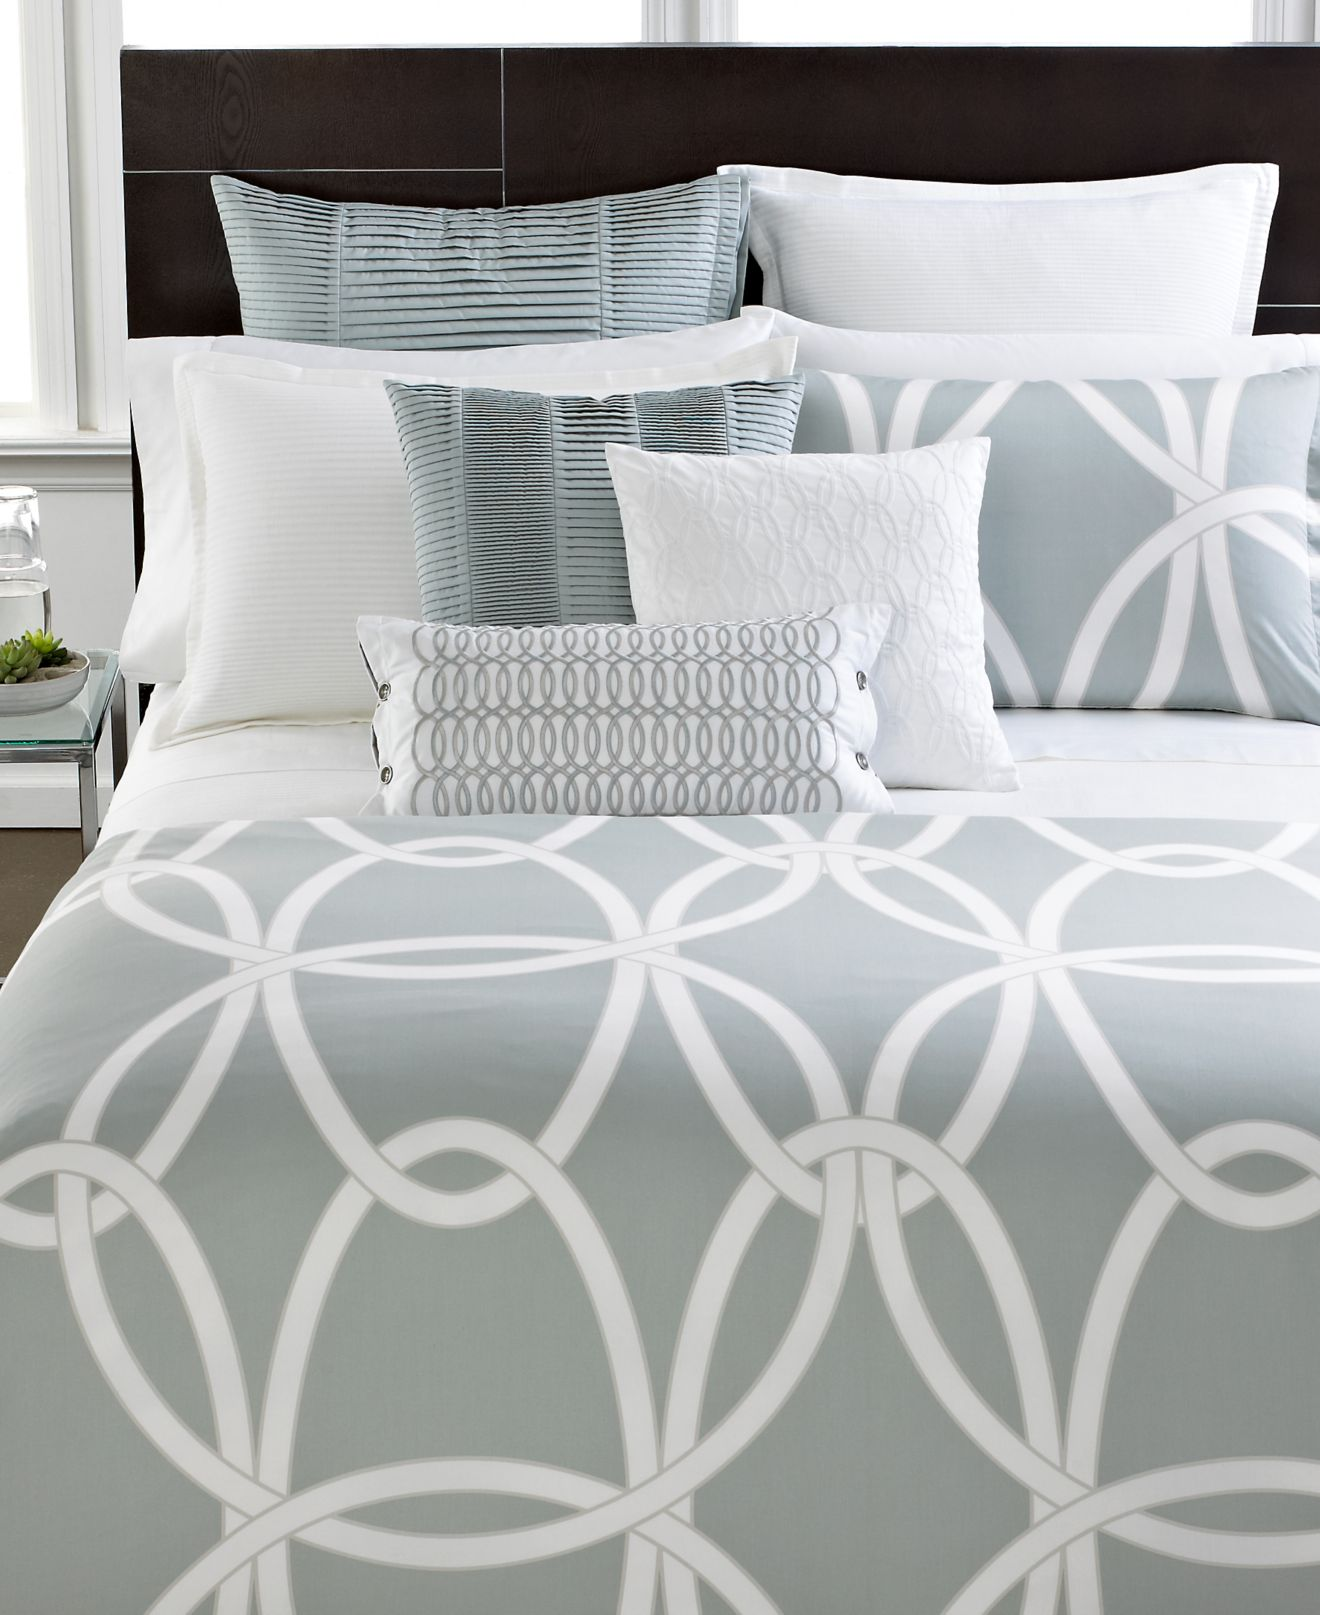 modern pea pod bedding - bedding | bed linen